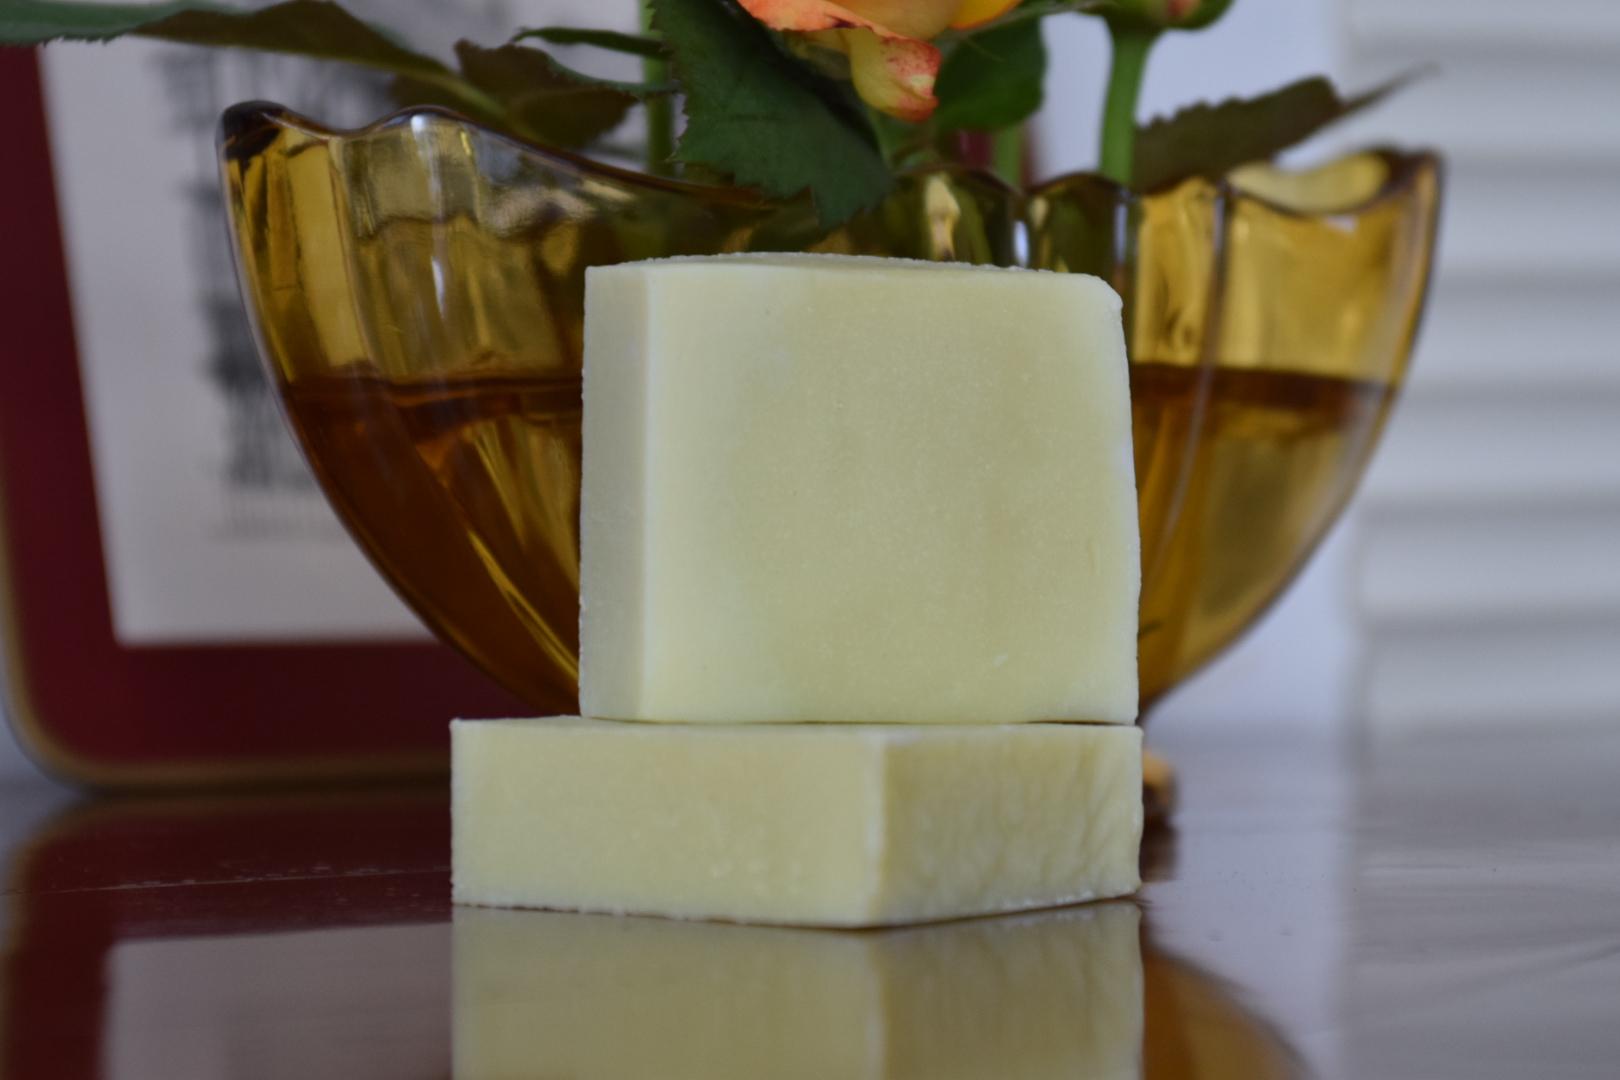 Aromatherapy soap frankincense geranium rose anti-aging artisanal